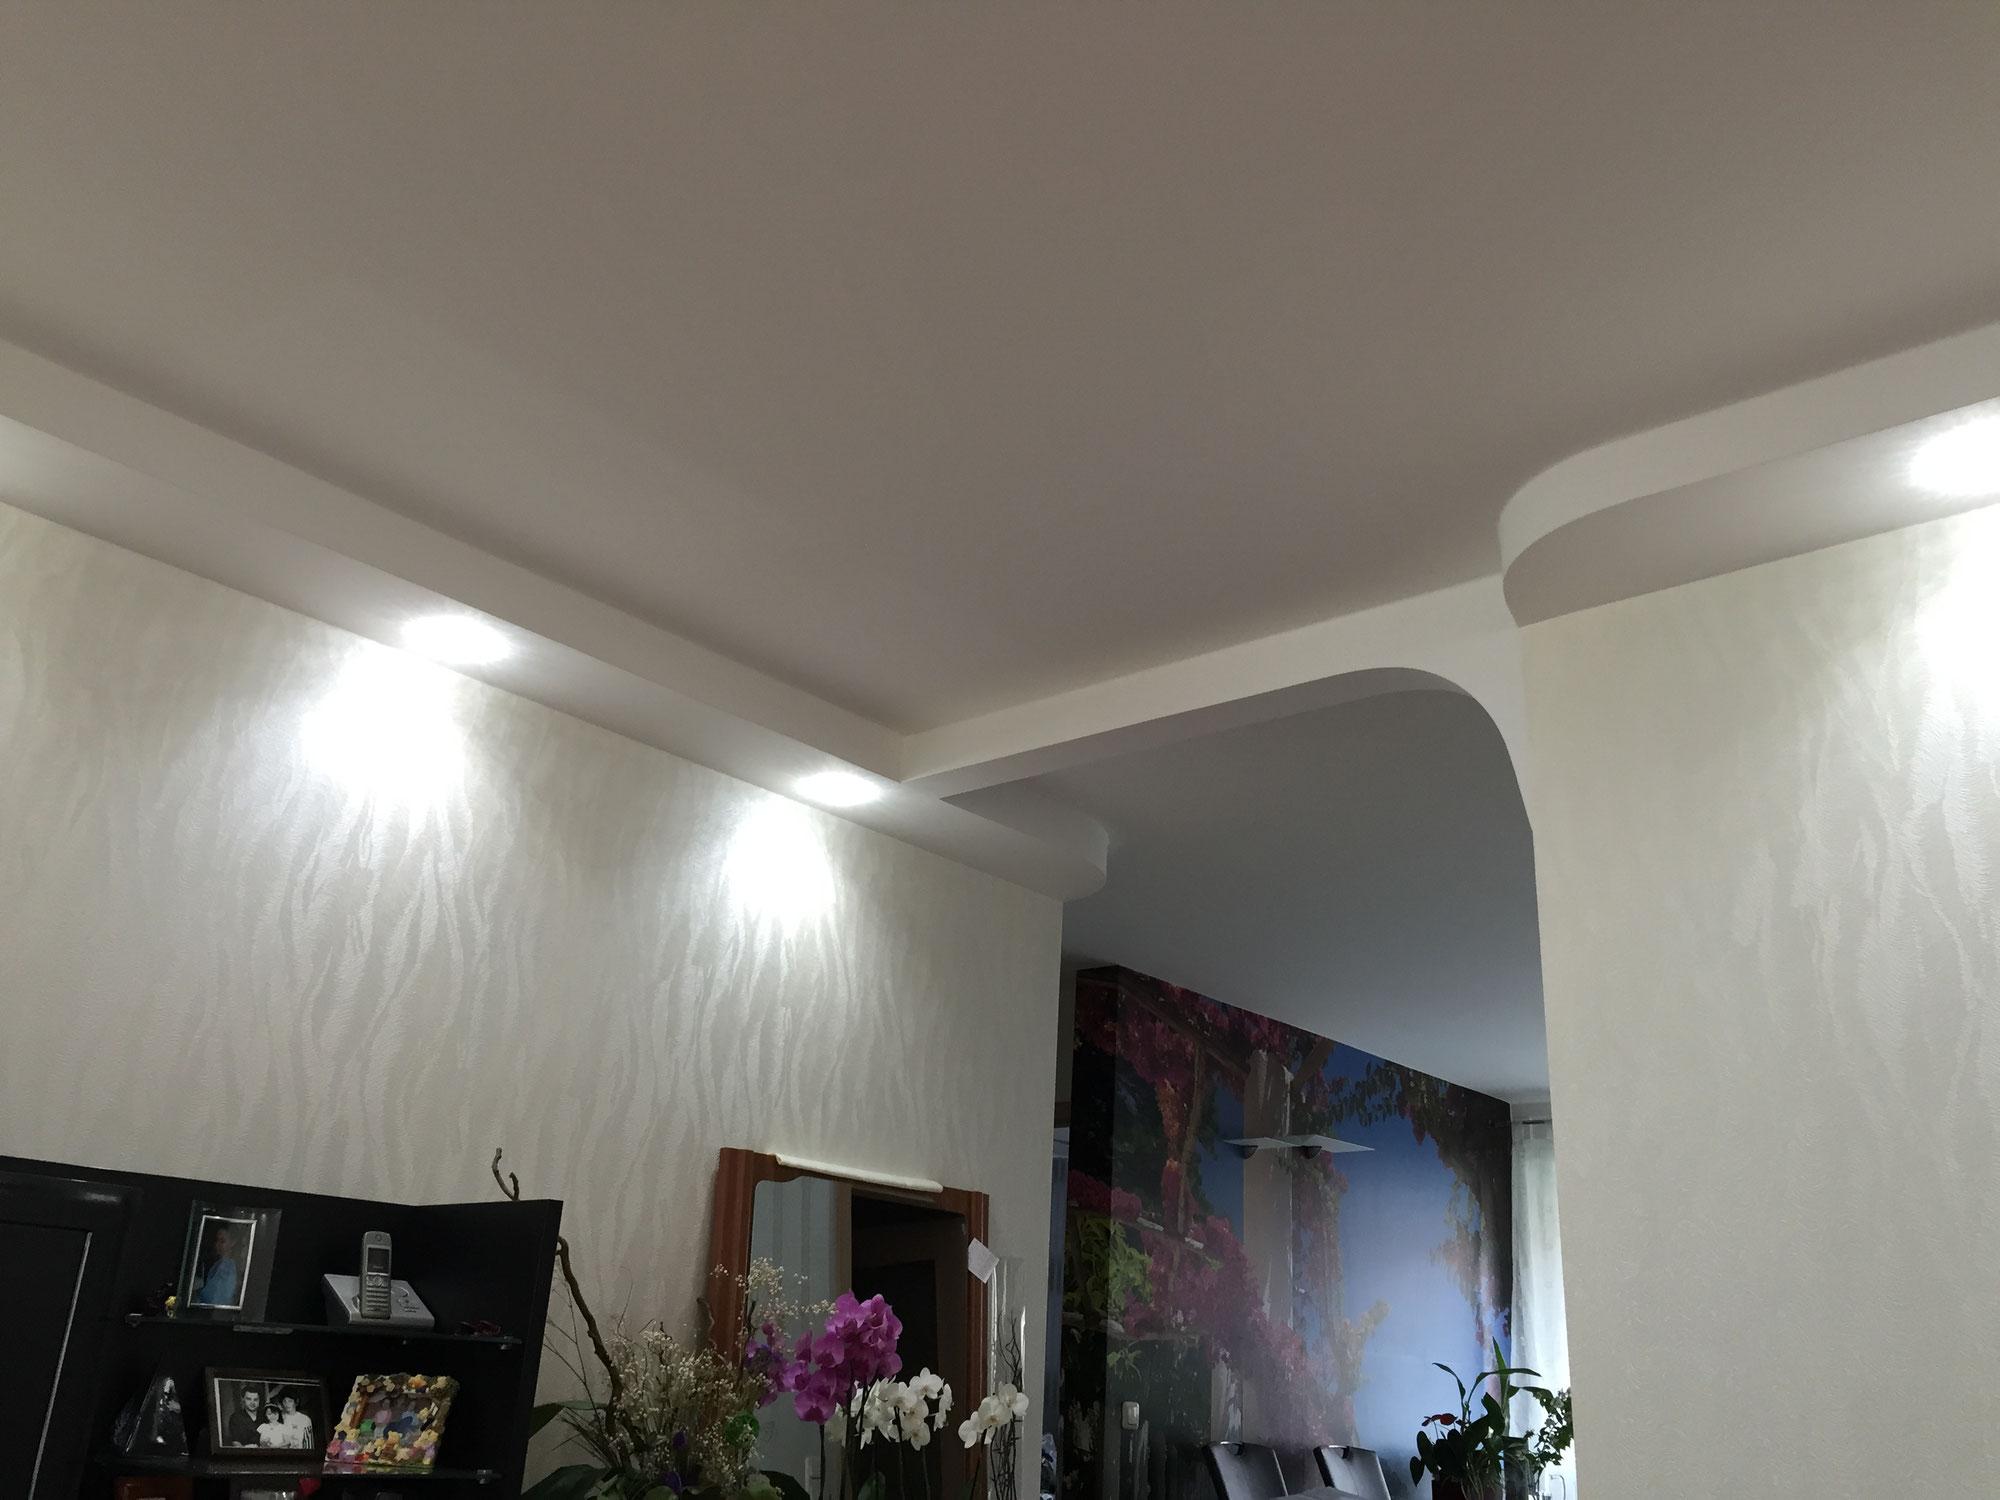 trockenbau lasarkewitsch n rnberg dl trockenbaus webseite. Black Bedroom Furniture Sets. Home Design Ideas